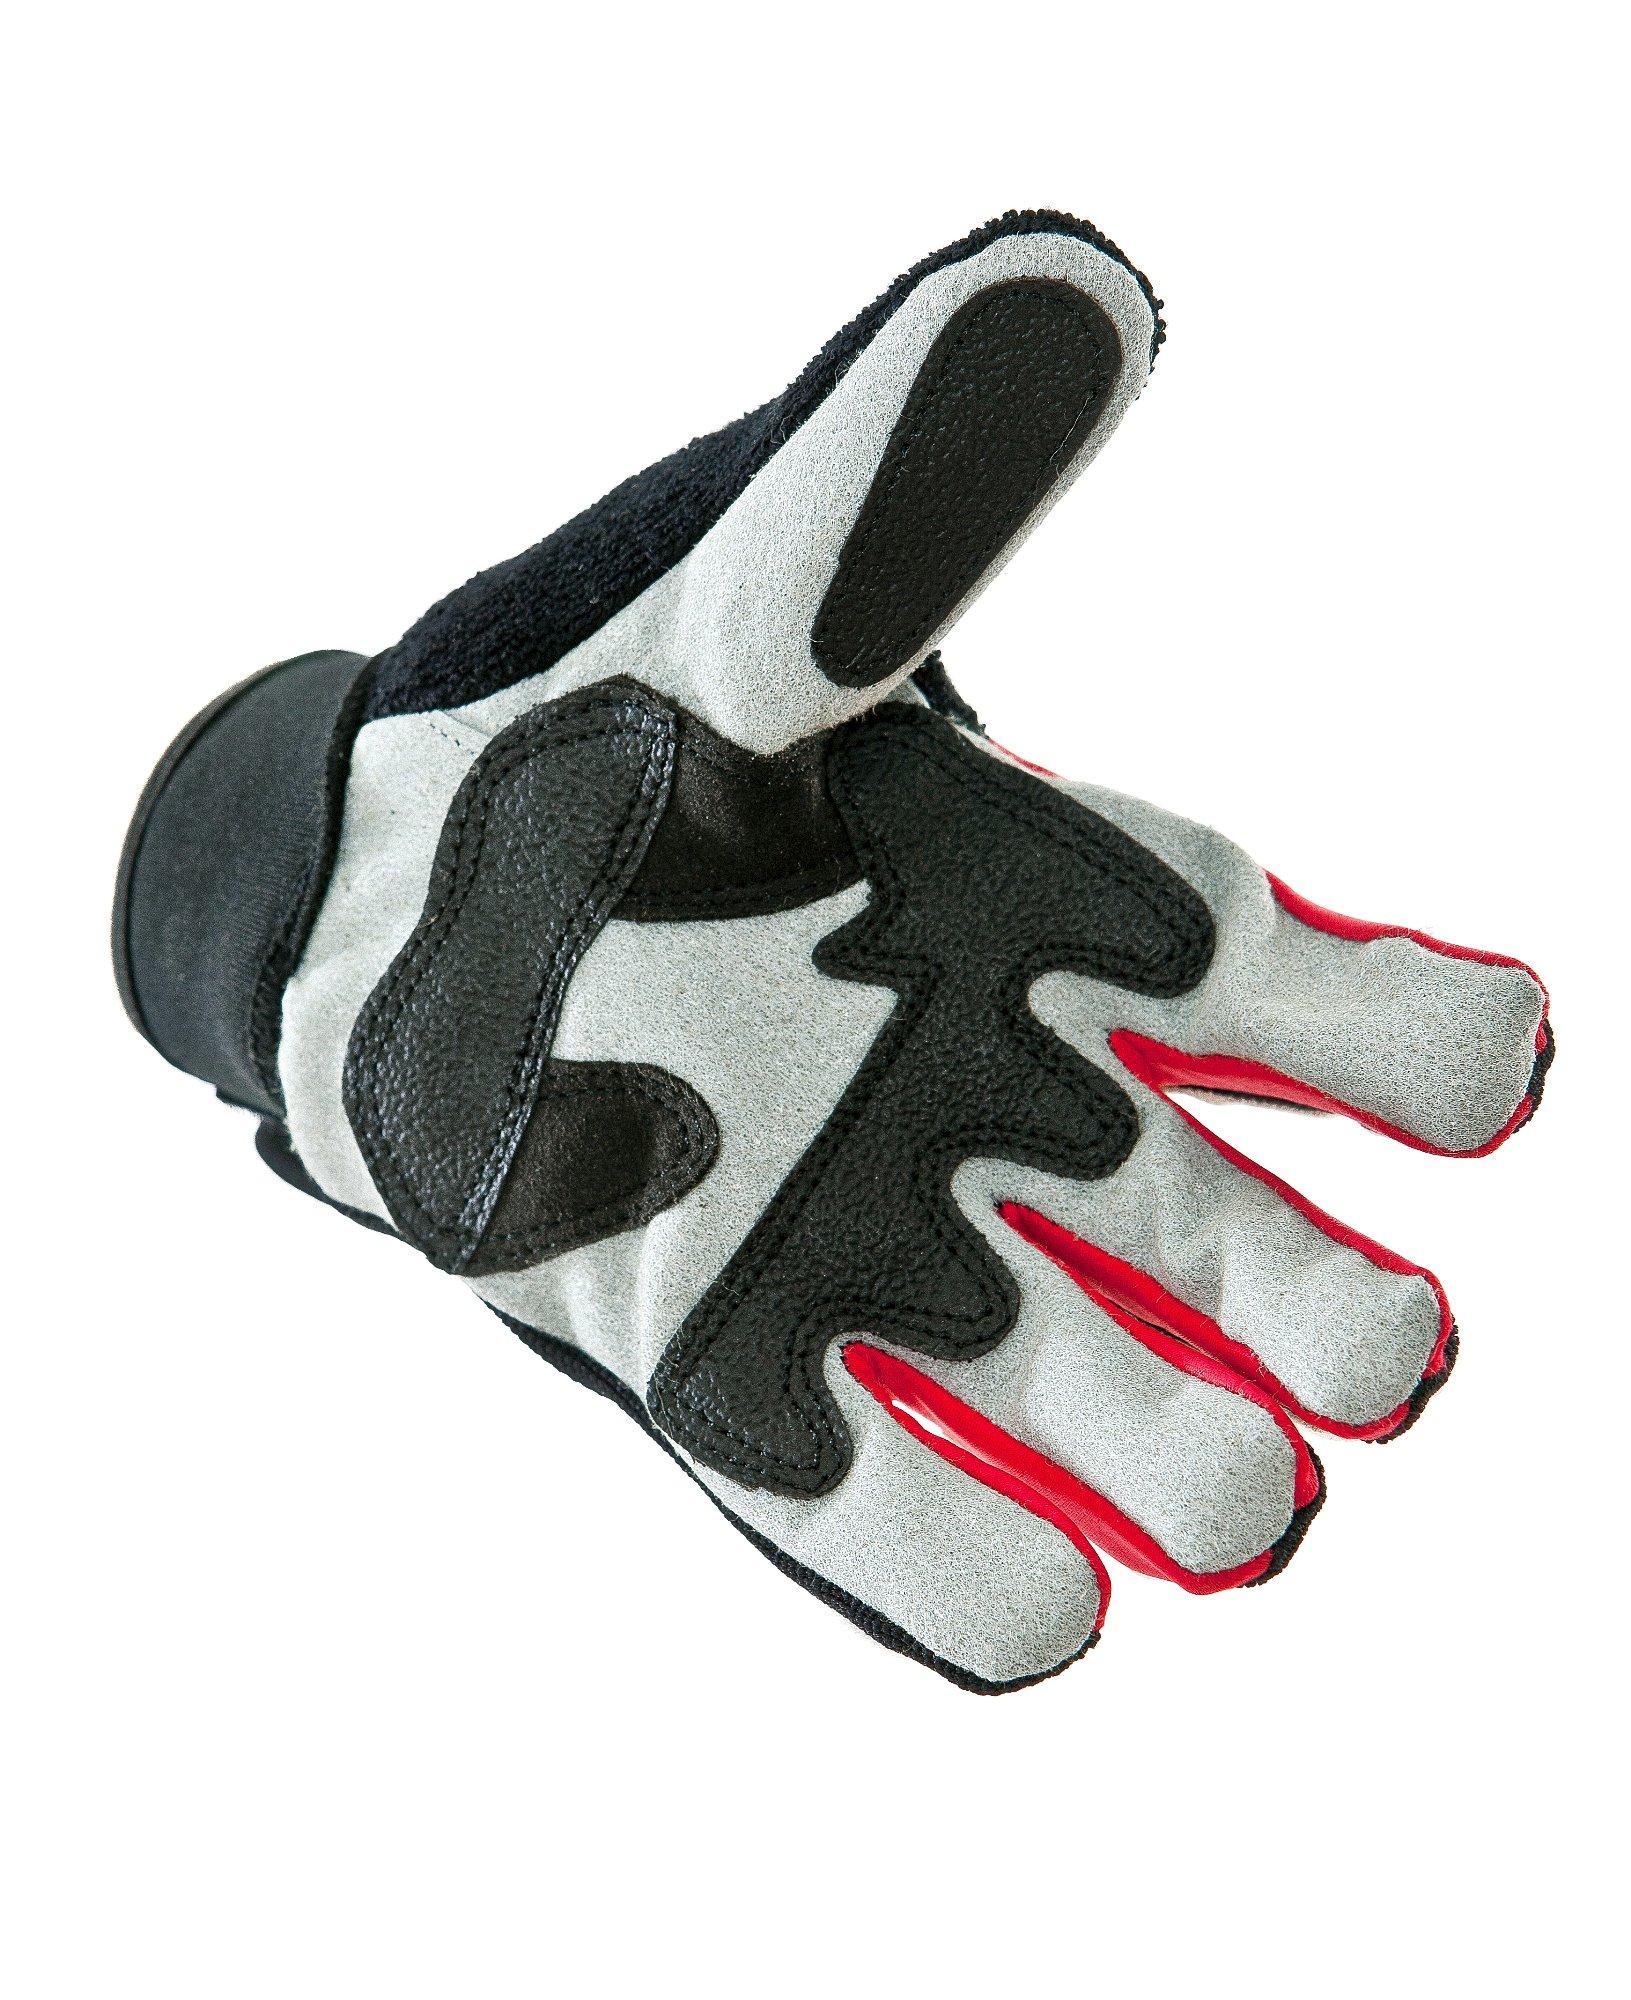 Junior Bmx Viper Bike Gloves by Sport DirectTM (Image #6)